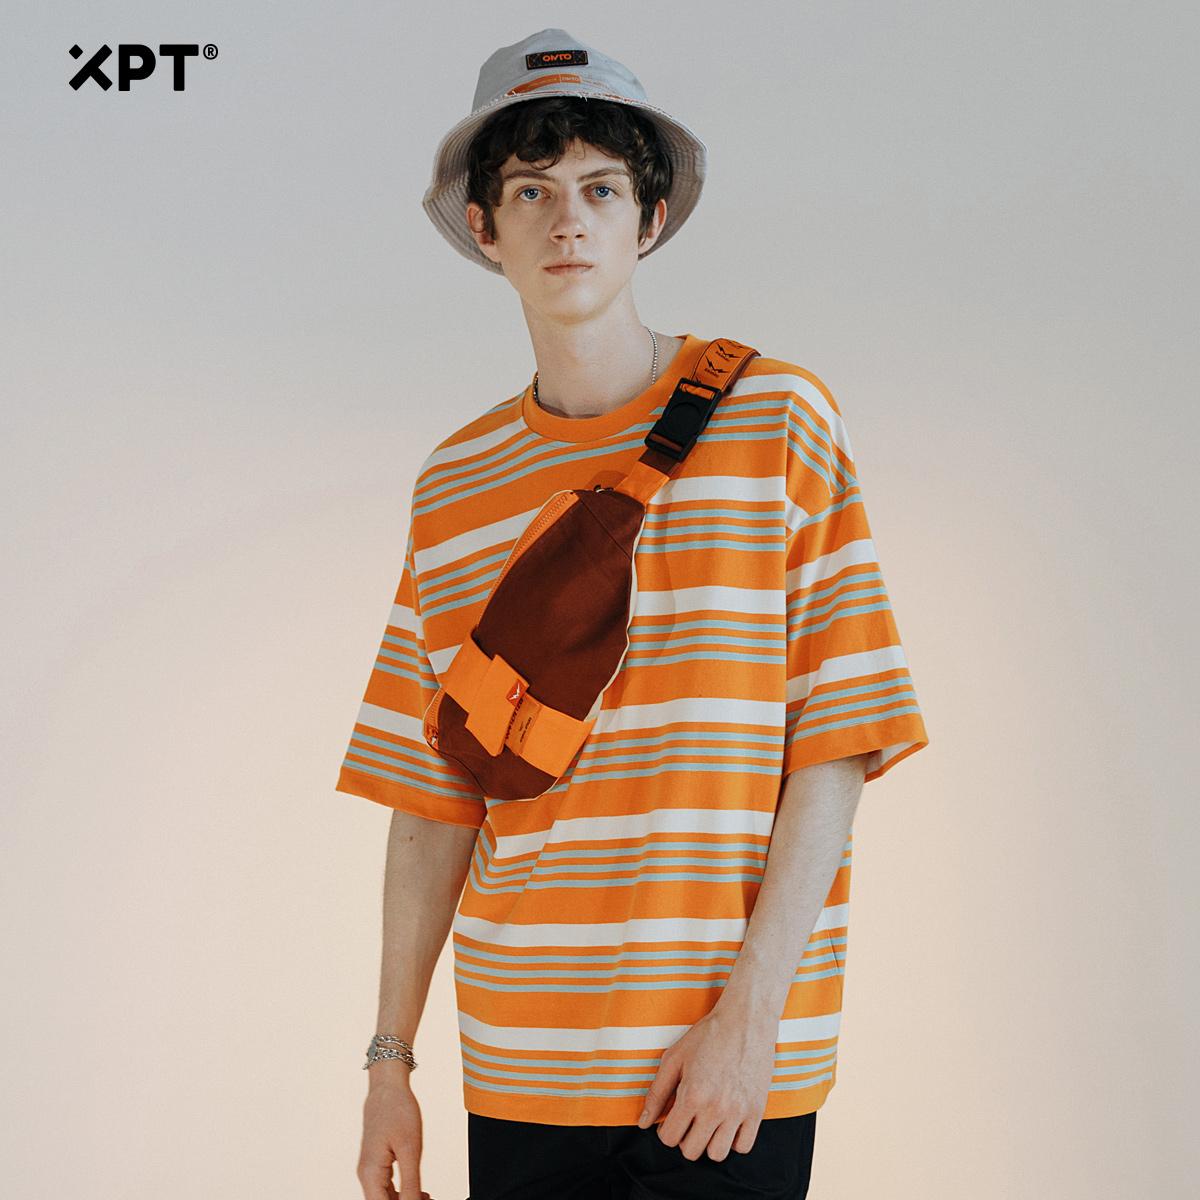 XPT情侣短袖t恤男港风潮牌个性时尚宽松oversize半袖条纹体恤ins